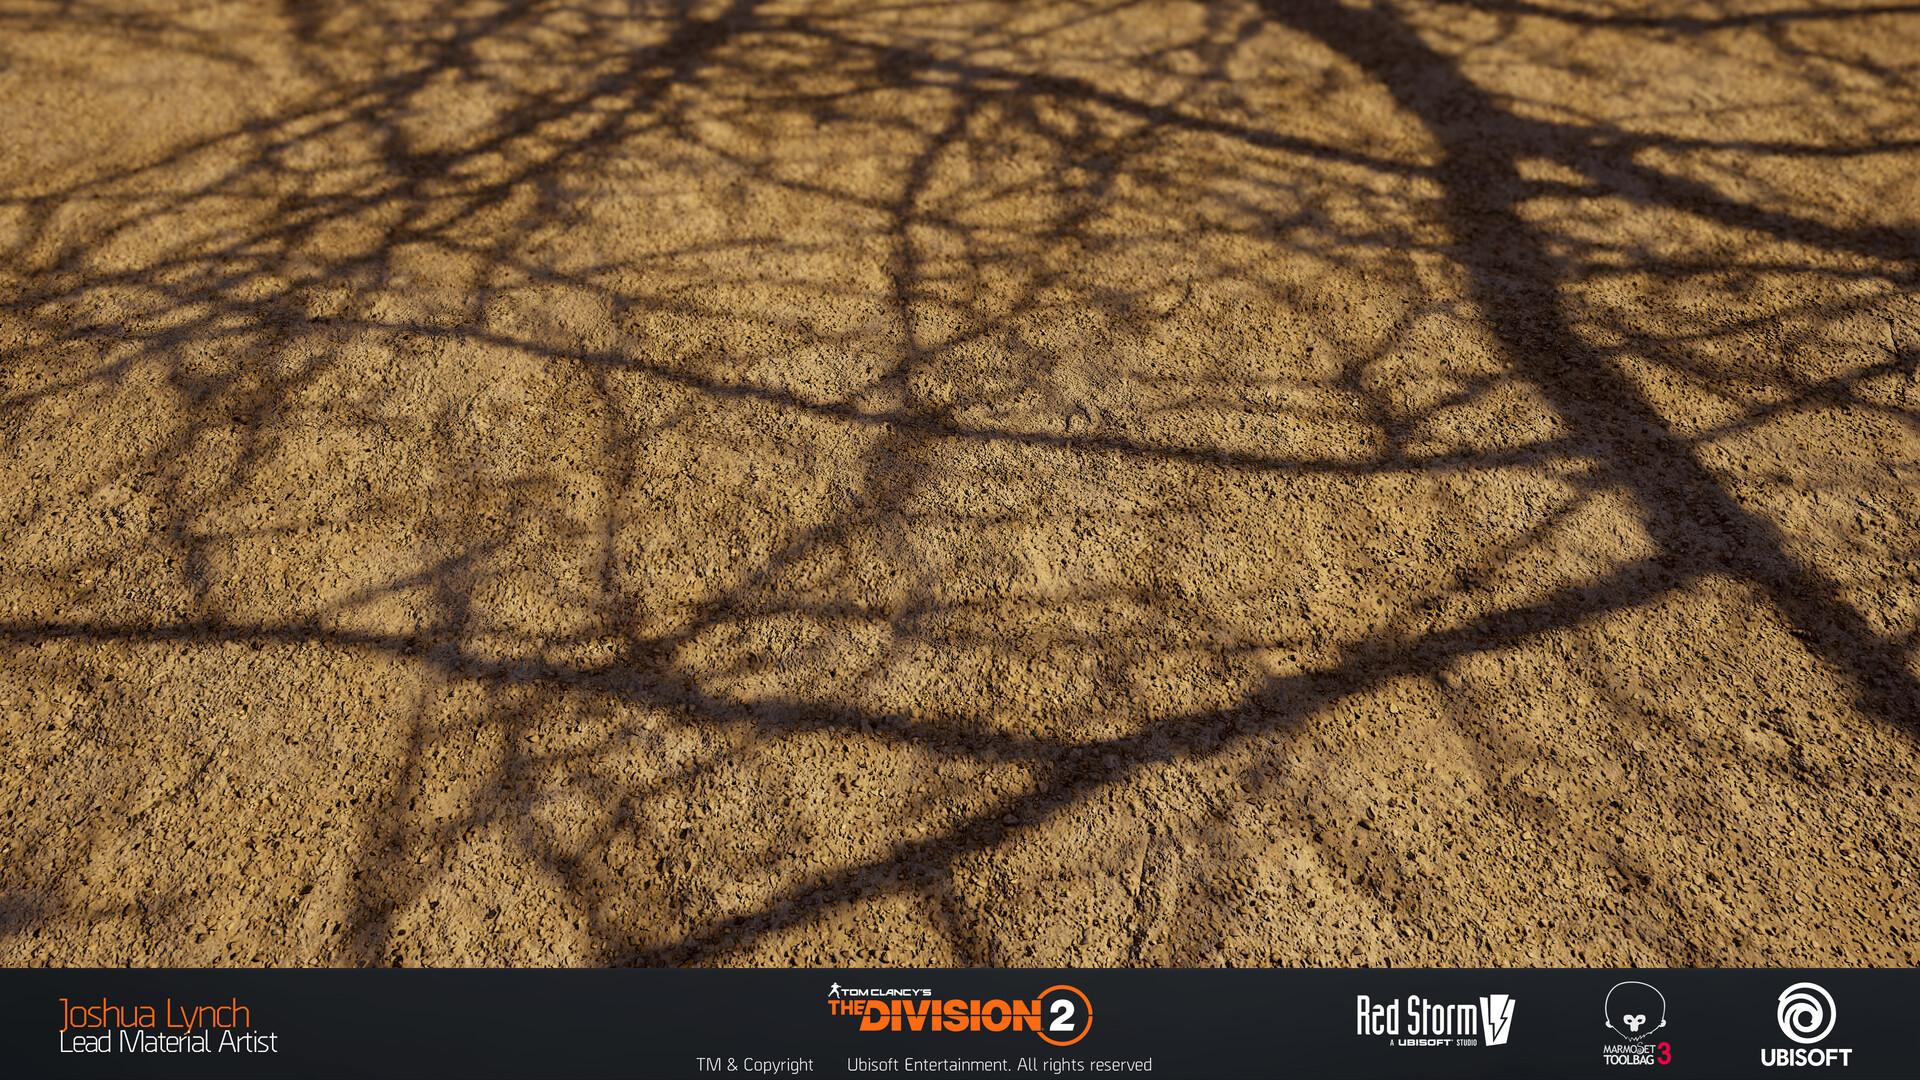 Joshua lynch division 2 josh lynch soil gravel 02 ground